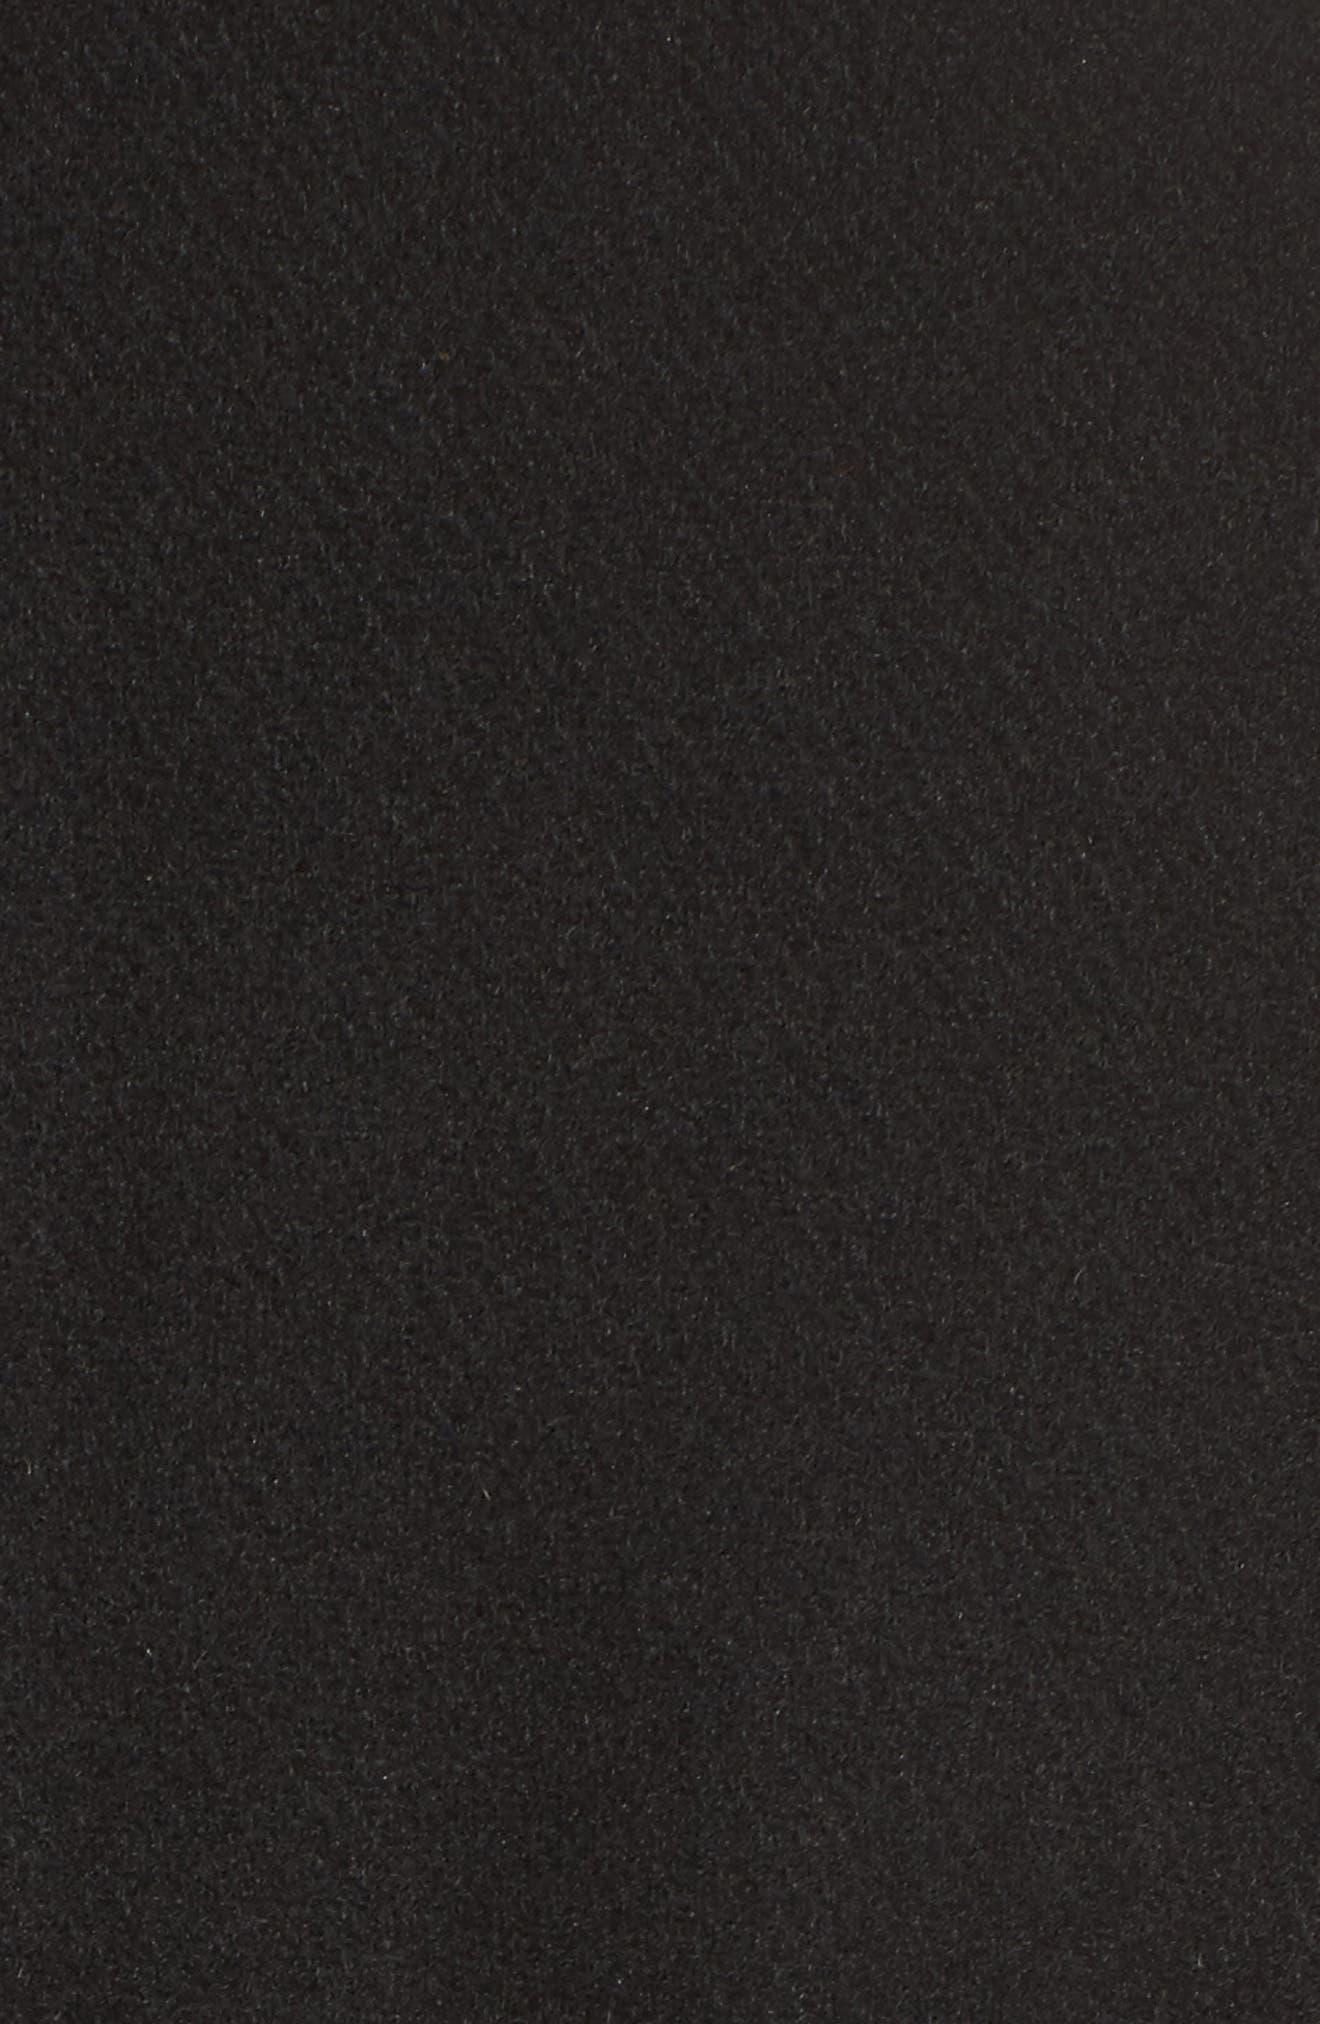 Wool Blend Coat,                             Alternate thumbnail 11, color,